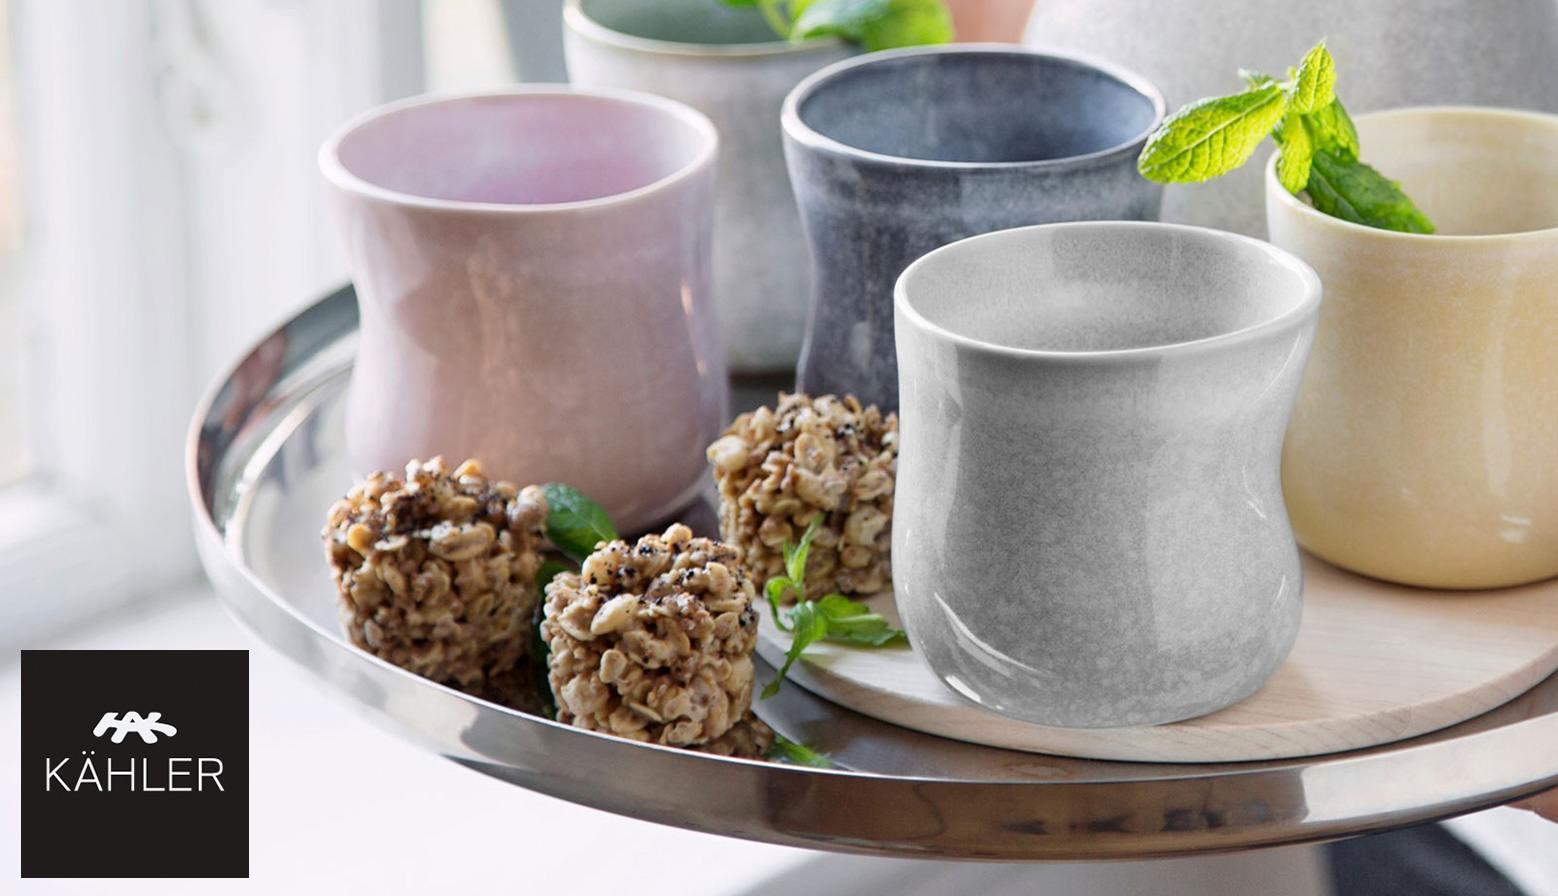 kaehler design keramik wunderschoen-gemacht